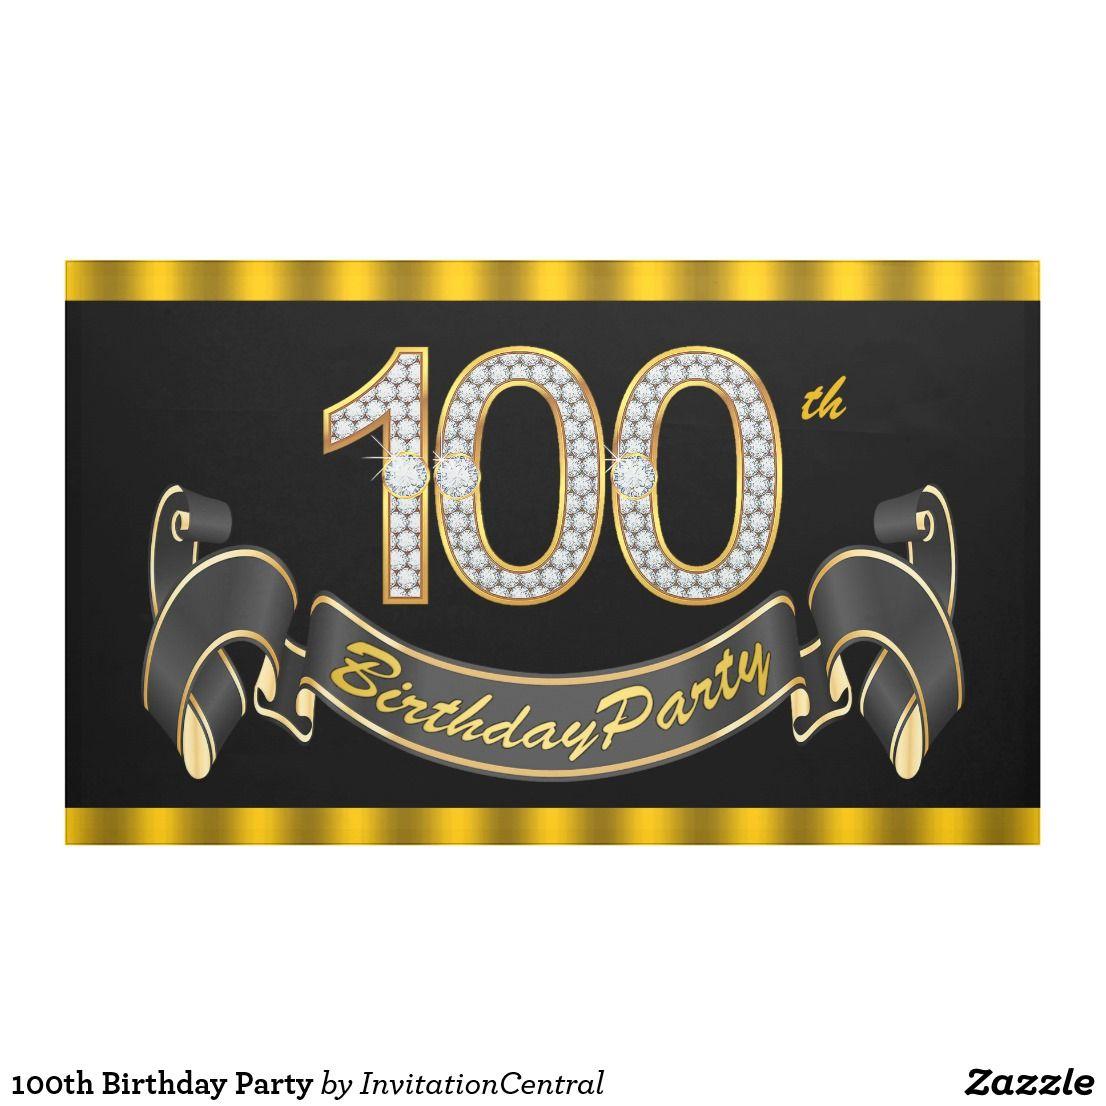 100 years loved banner 100th birthday banner 100 birthday decorations birthday banner 100 banner 100th birthday for her 100th birthday decor